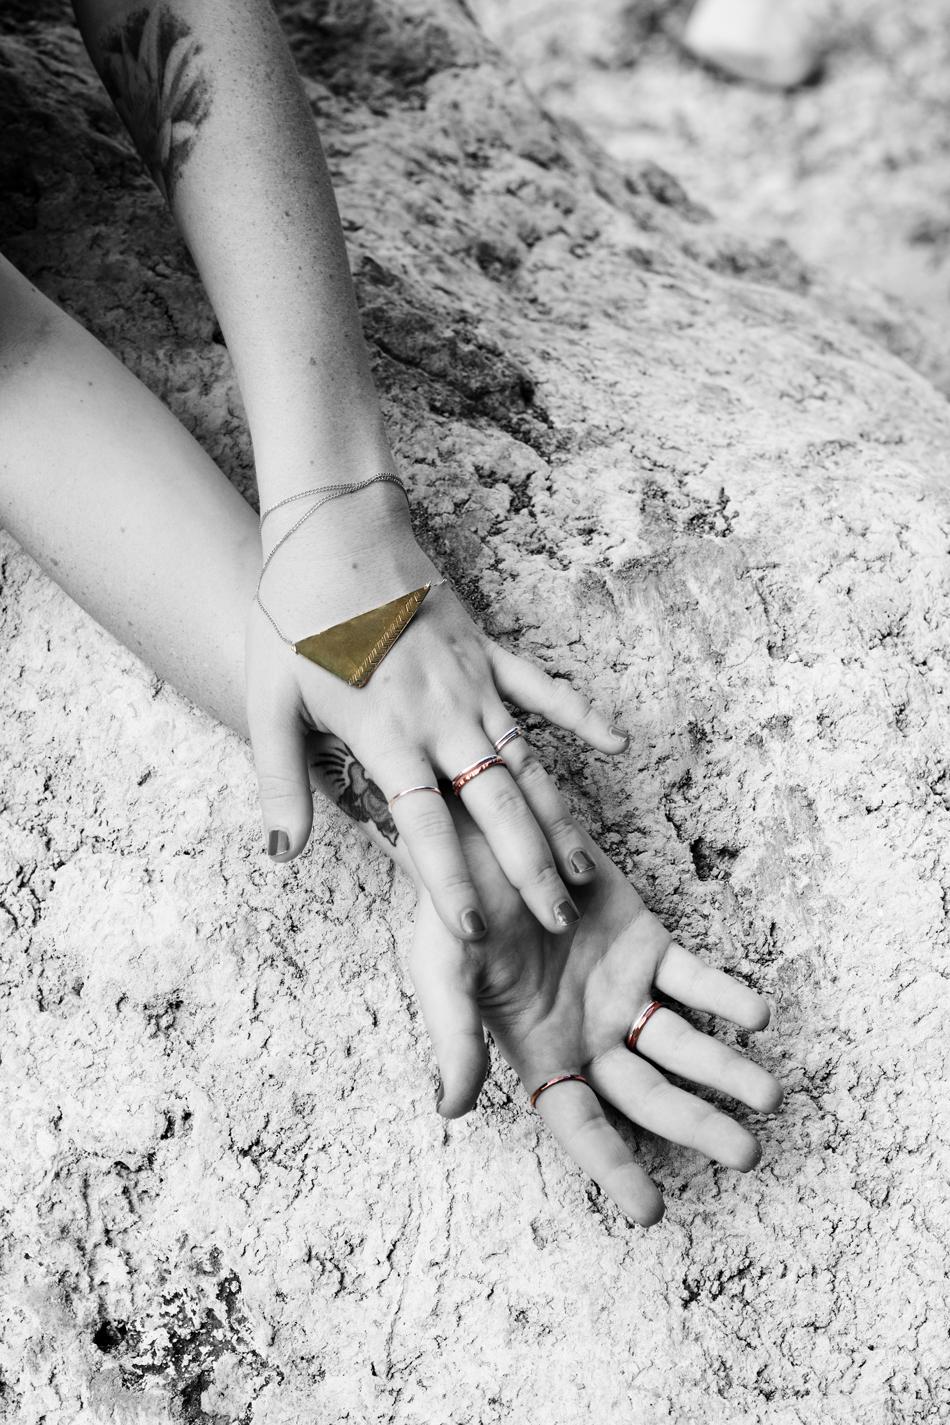 hannaheleanorjewelry